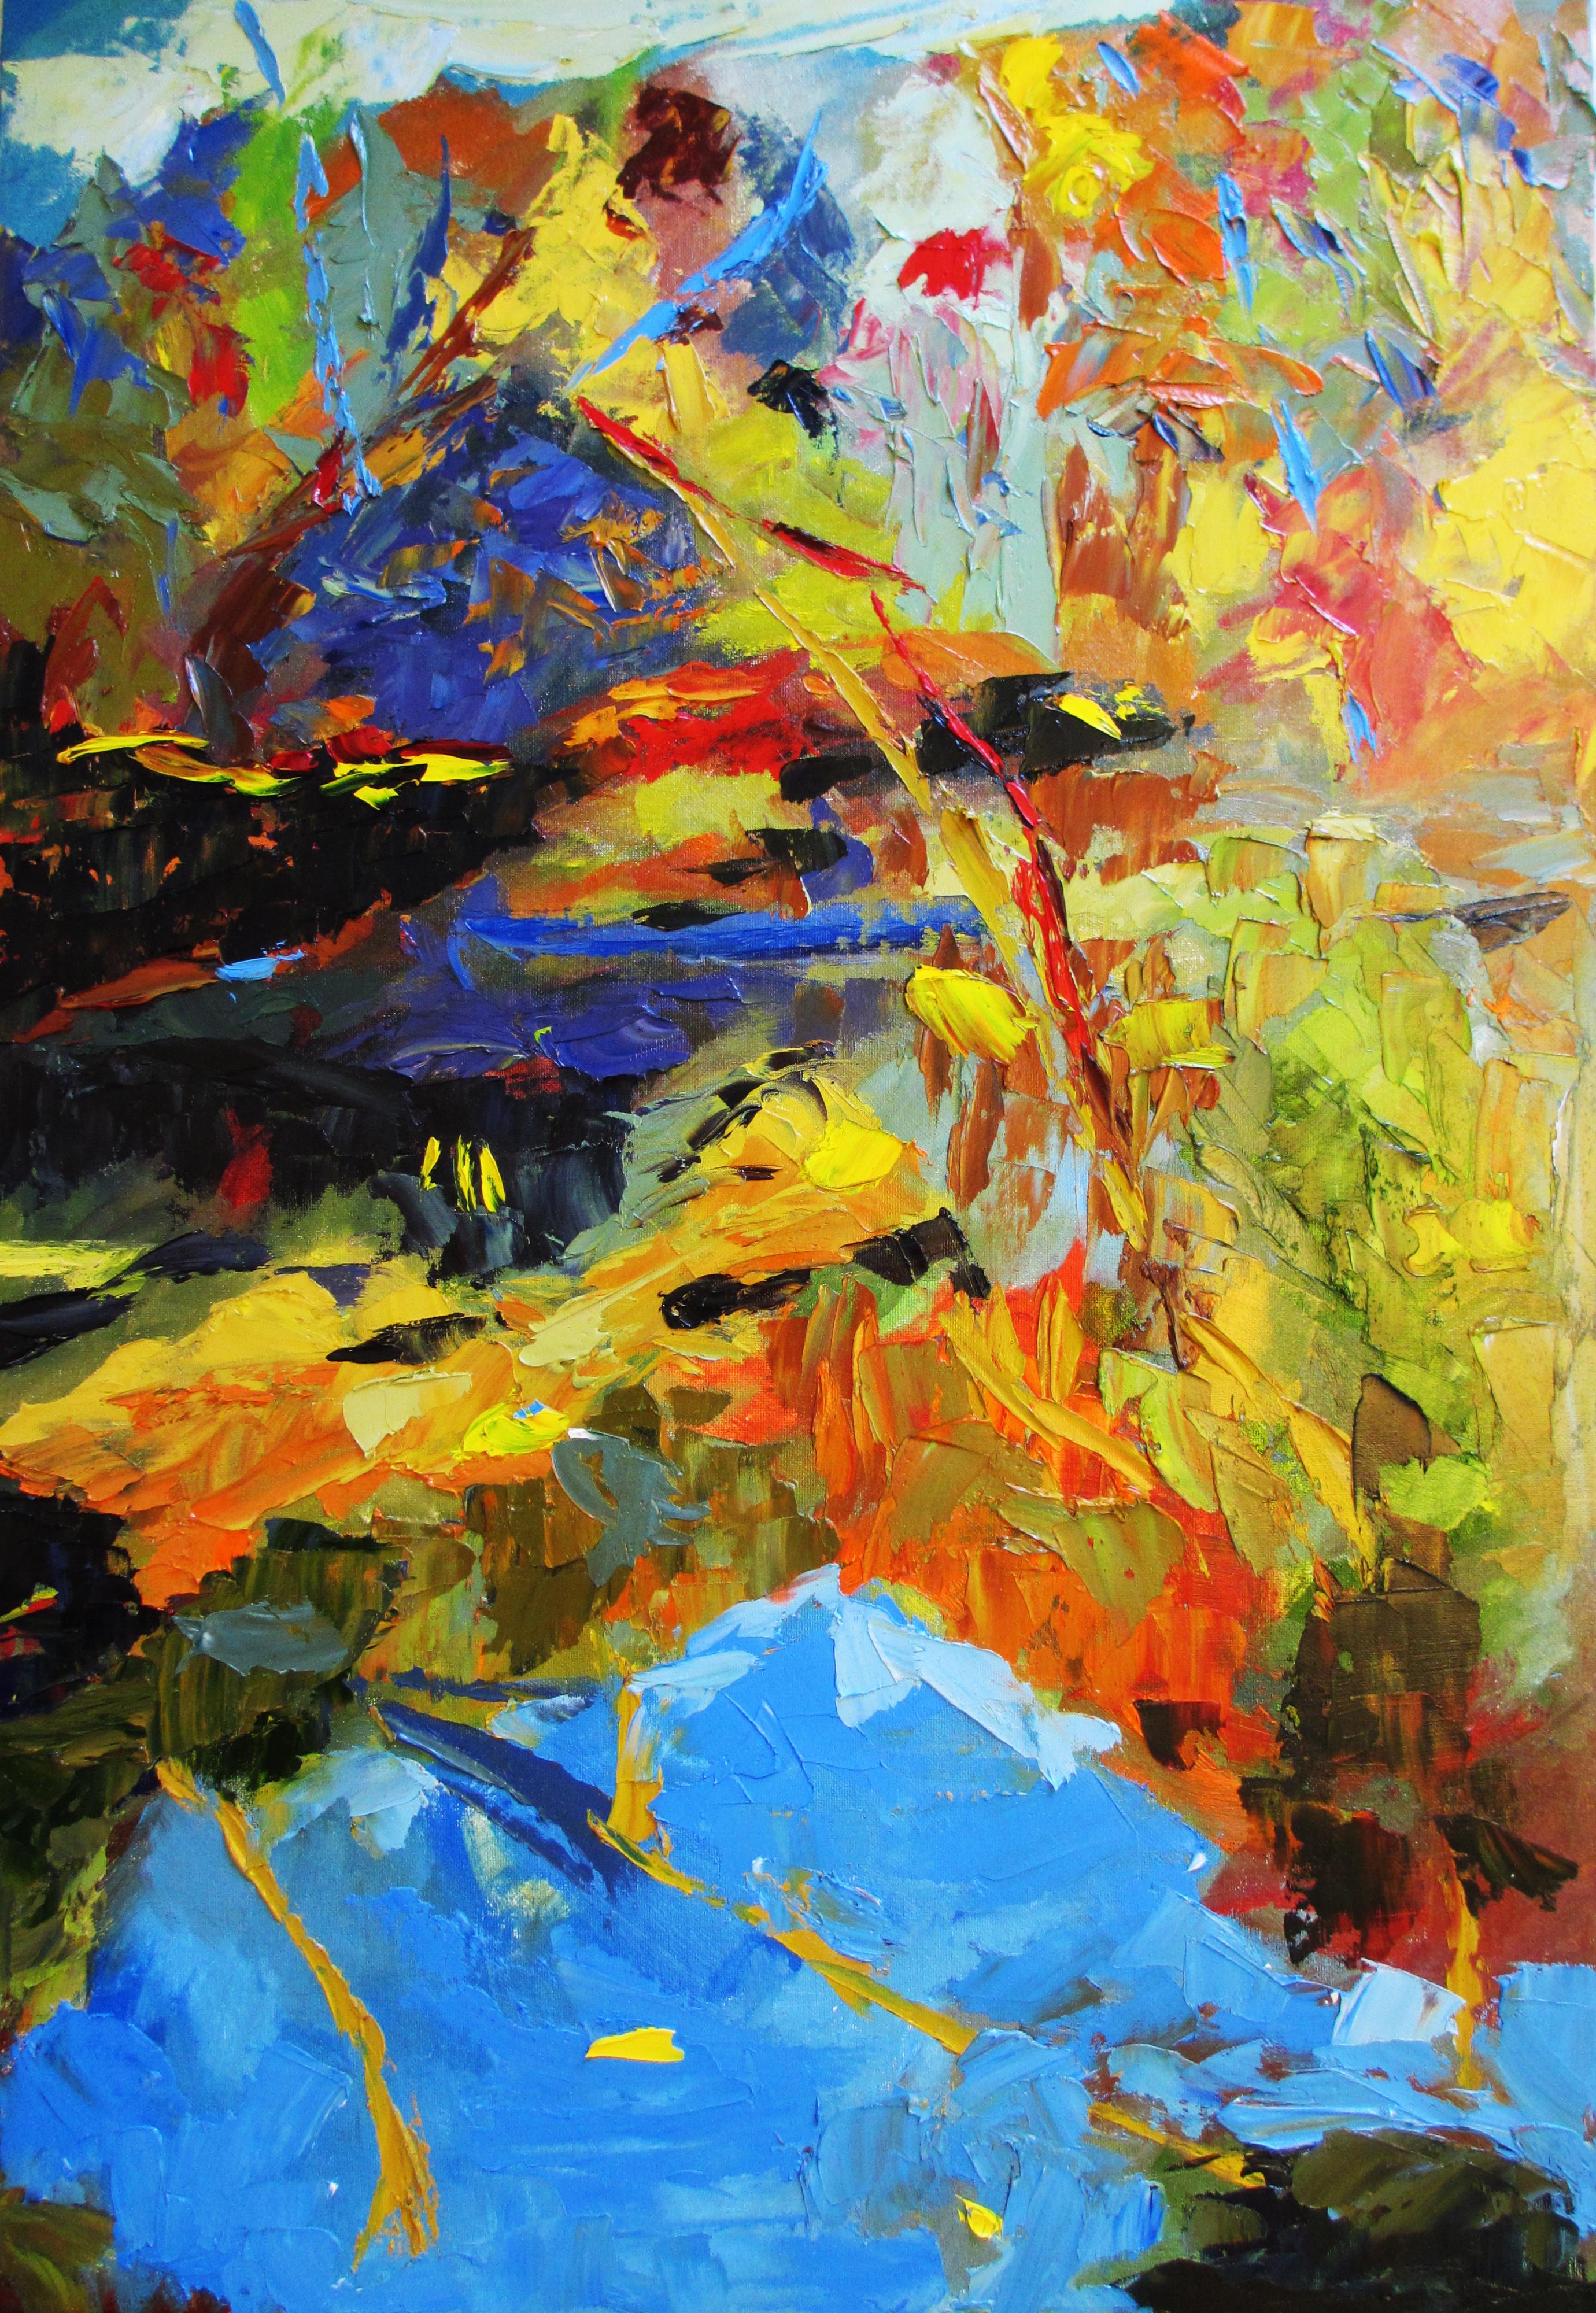 Vibha 36 x 24 Oil on canvas panel 2013